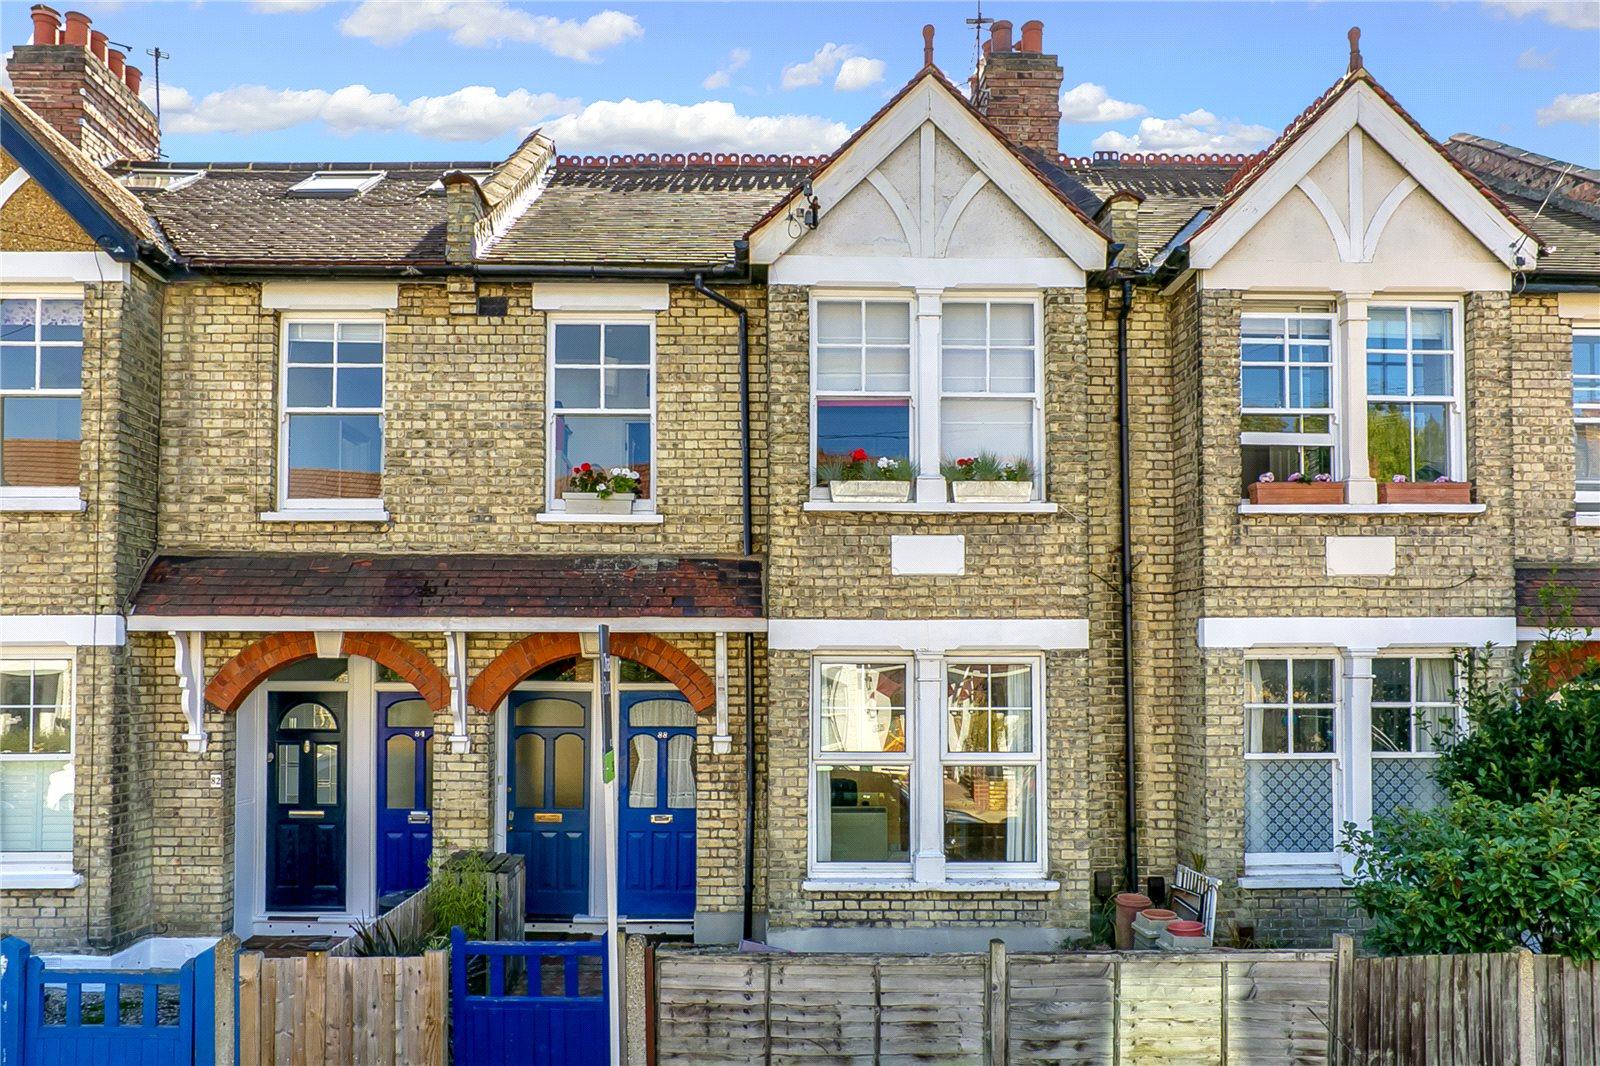 Kenley Road, Twickenham, TW1 1JU - Antony Roberts